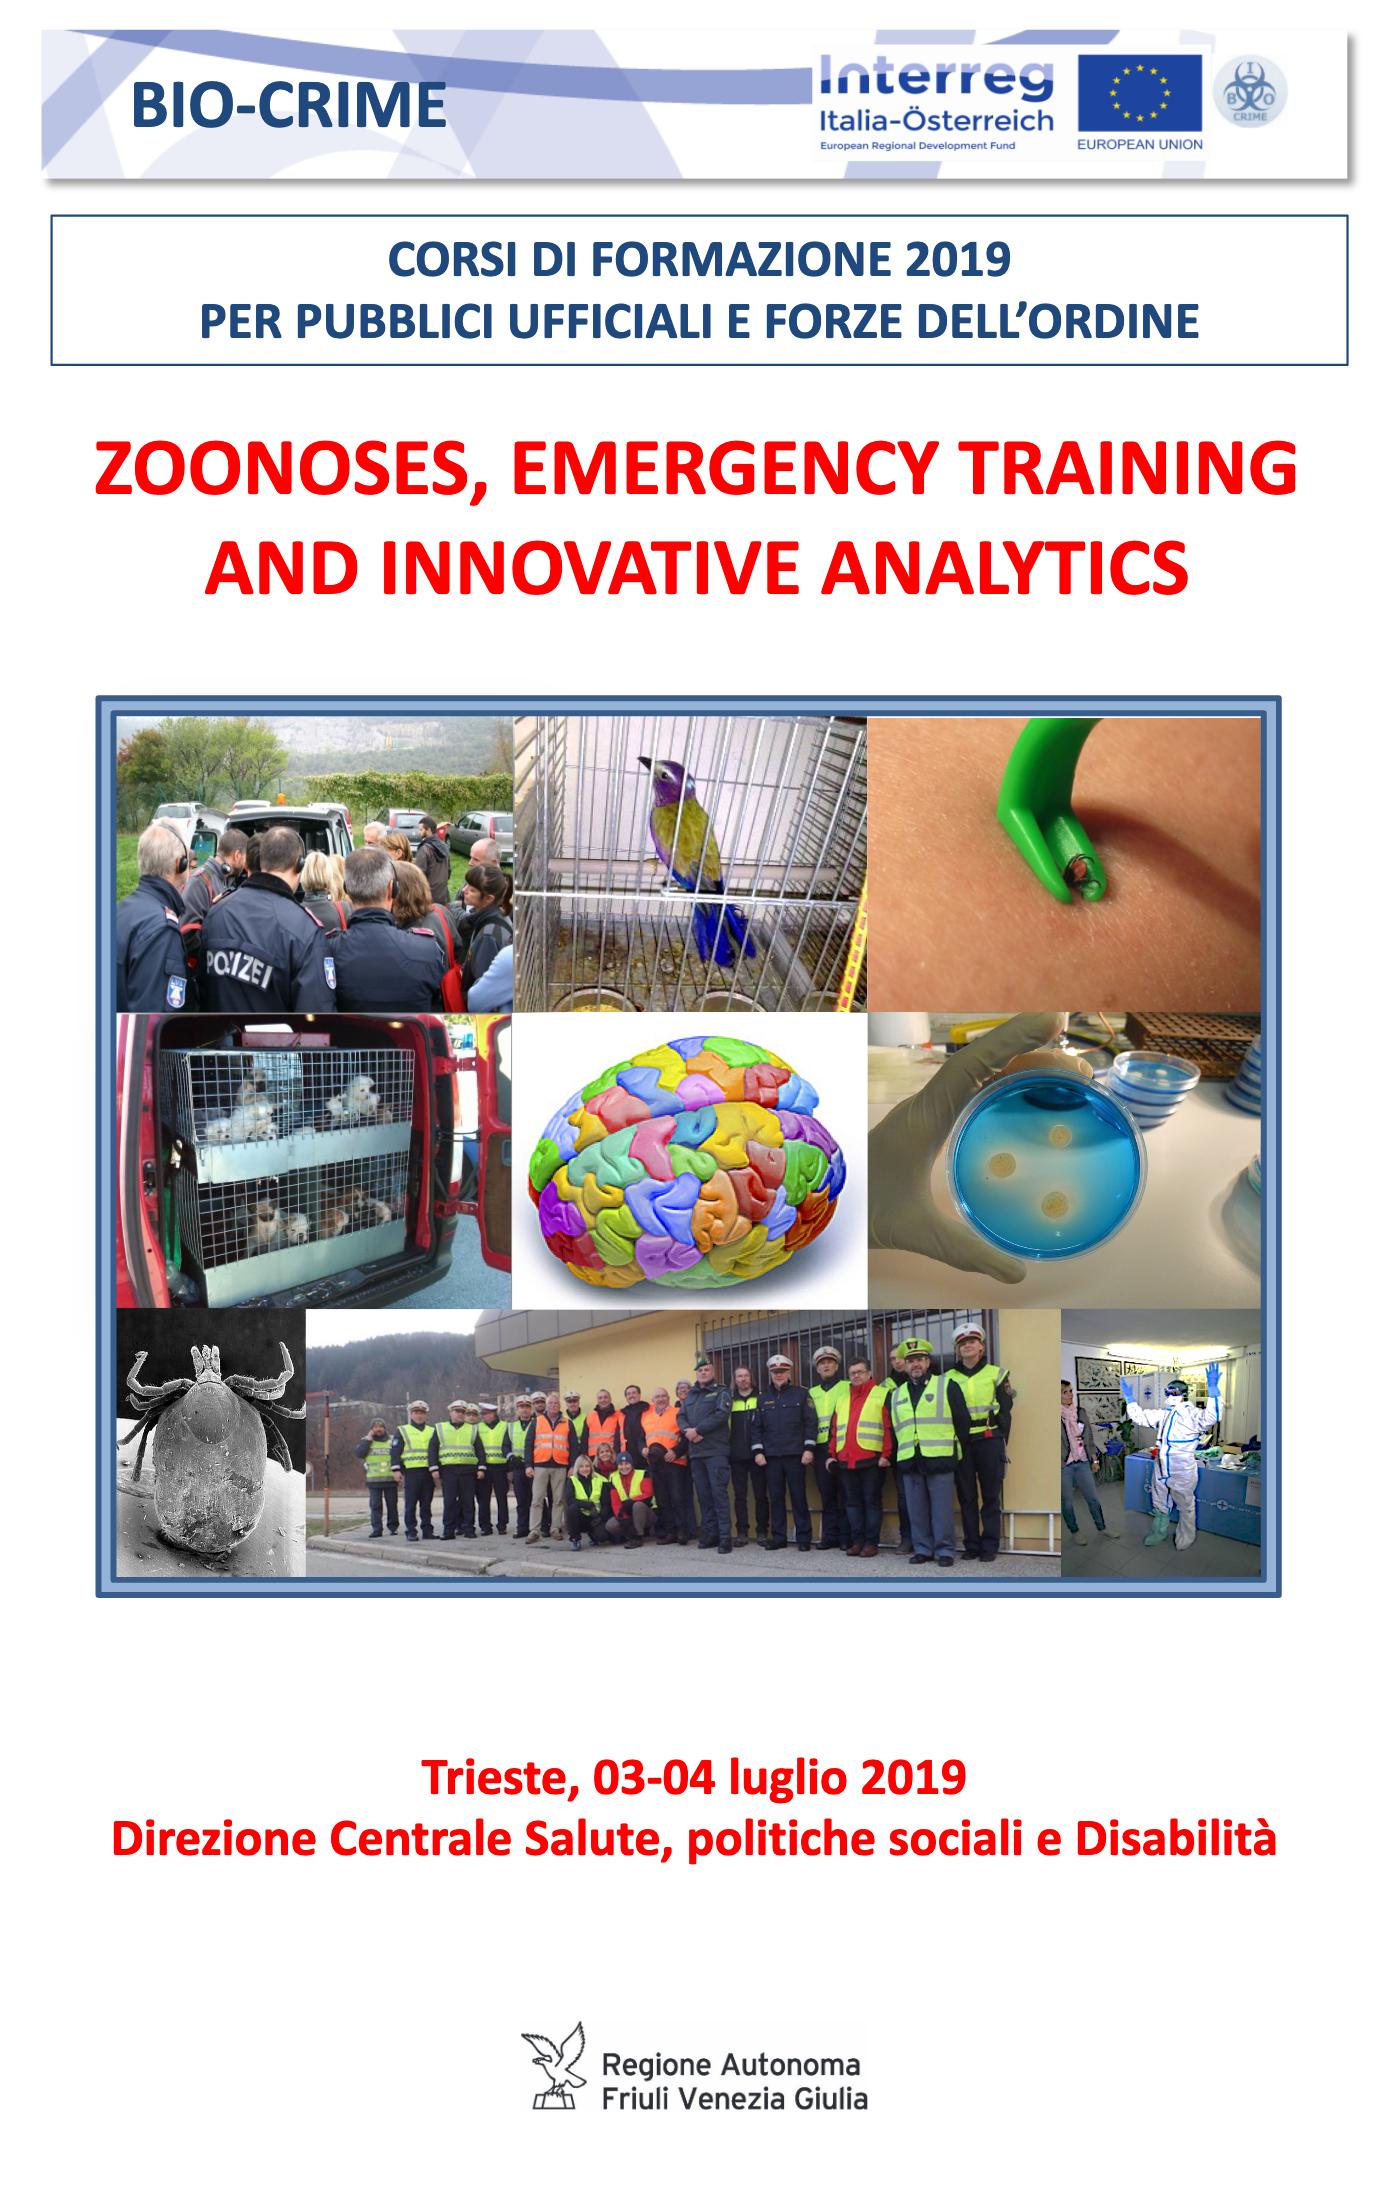 Bio-crime training course